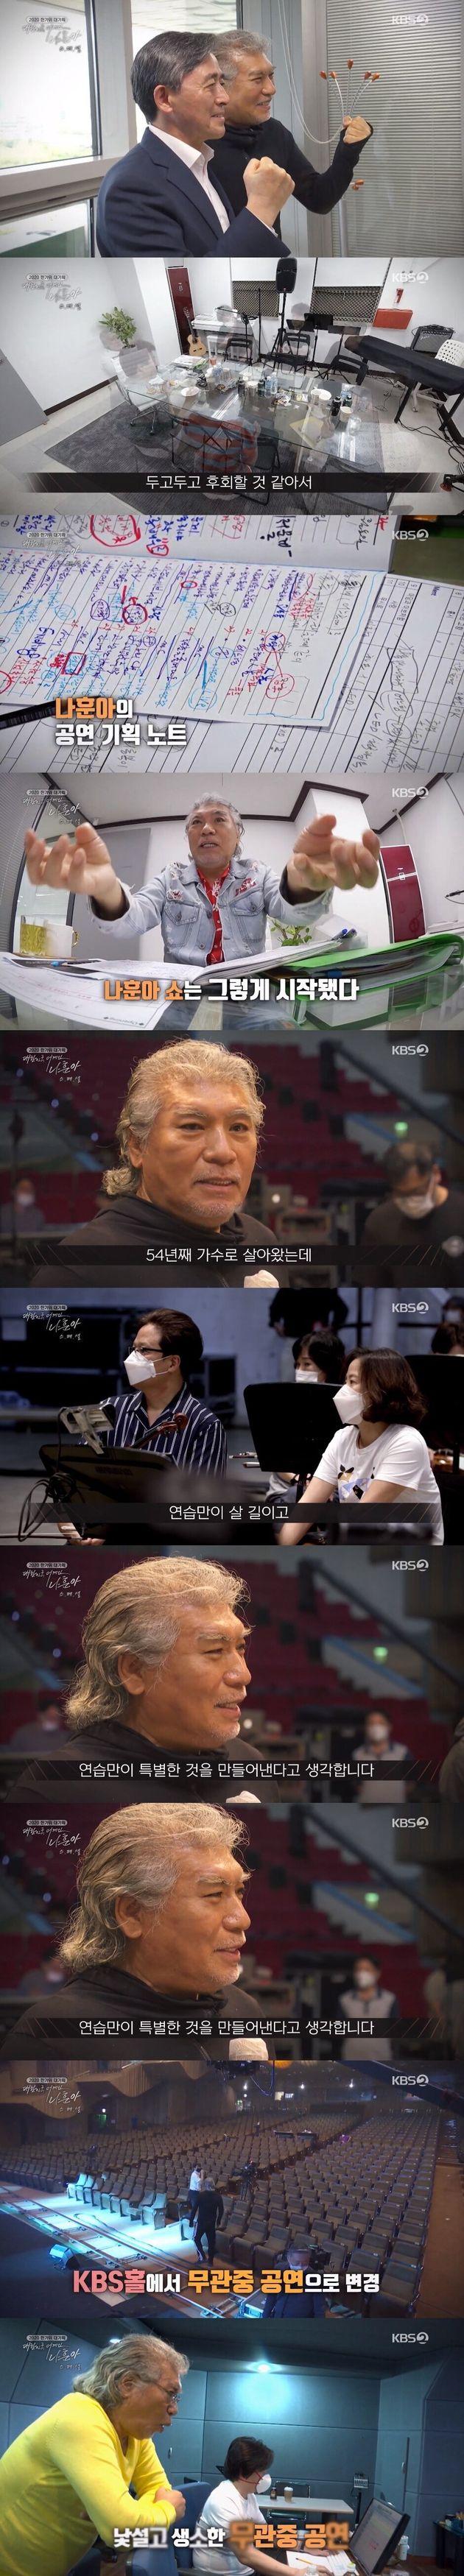 KBS 2TV '나훈아